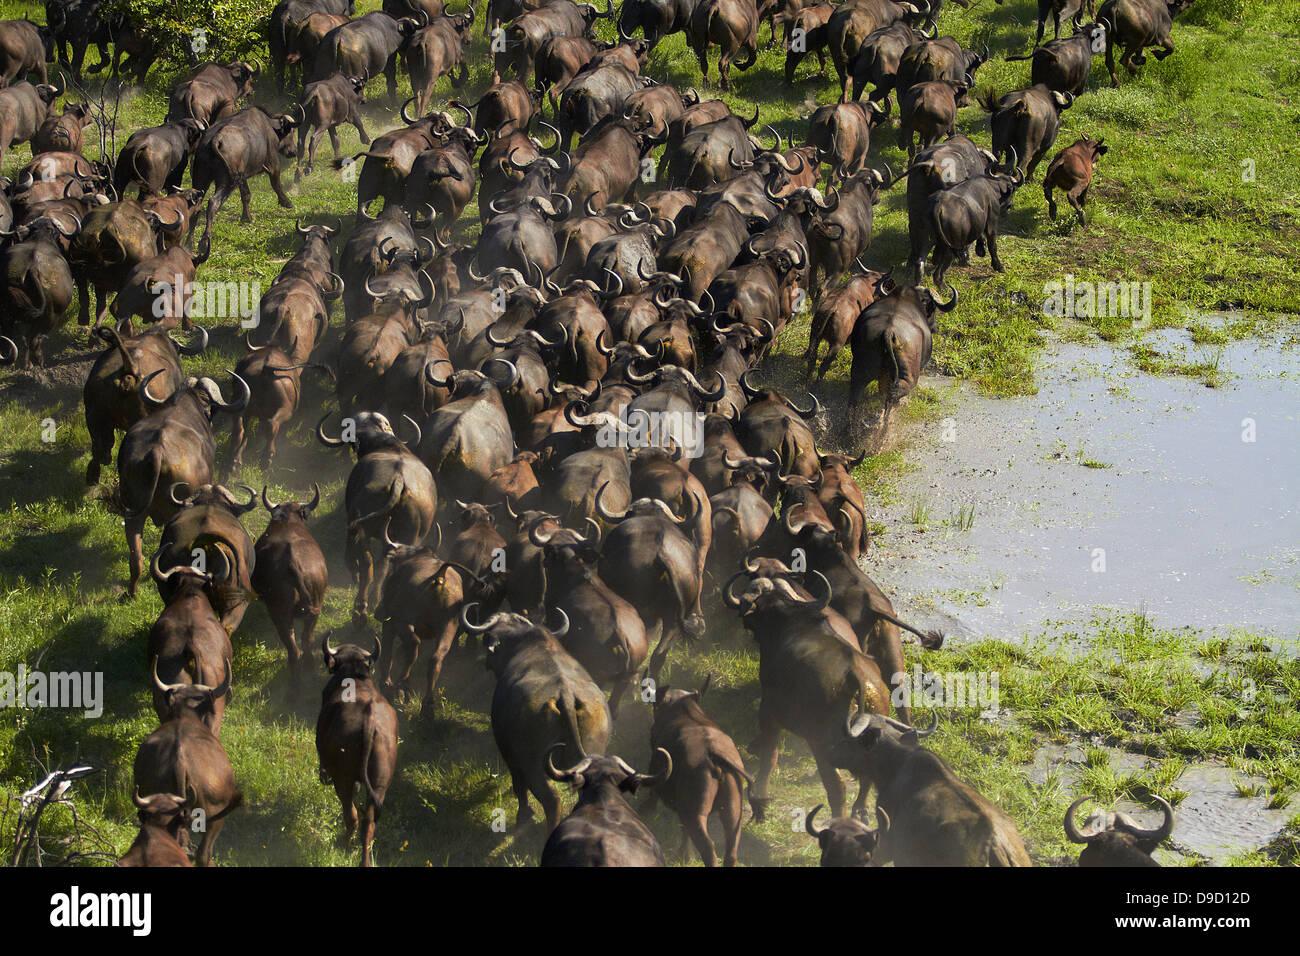 Cape buffalo (Syncerus caffer caffer), Okavango Delta, Botswana, Africa - aerial - Stock Image